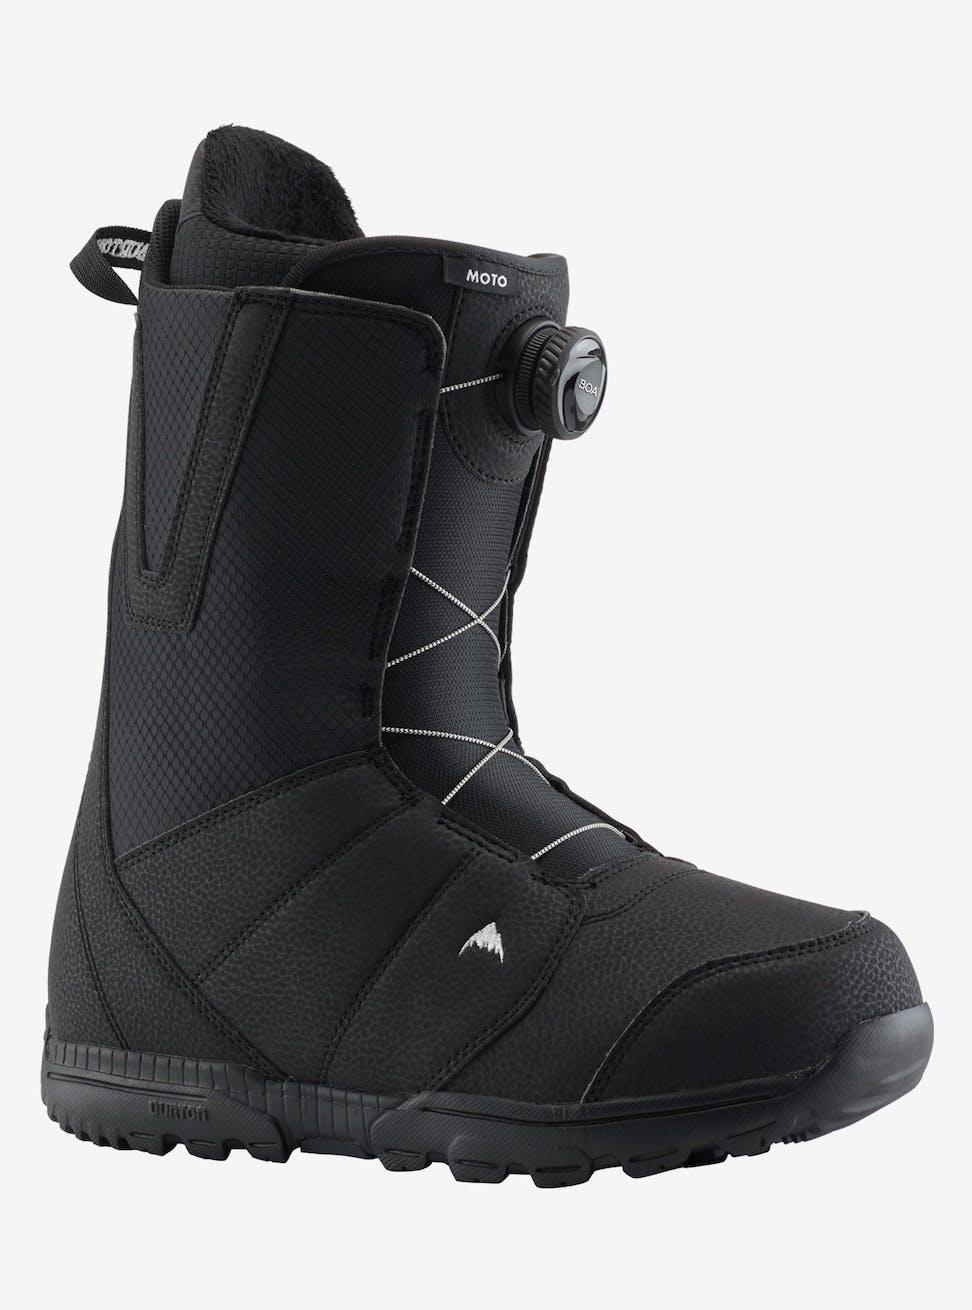 Burton Moto BOA Snowboard Boots · 2021